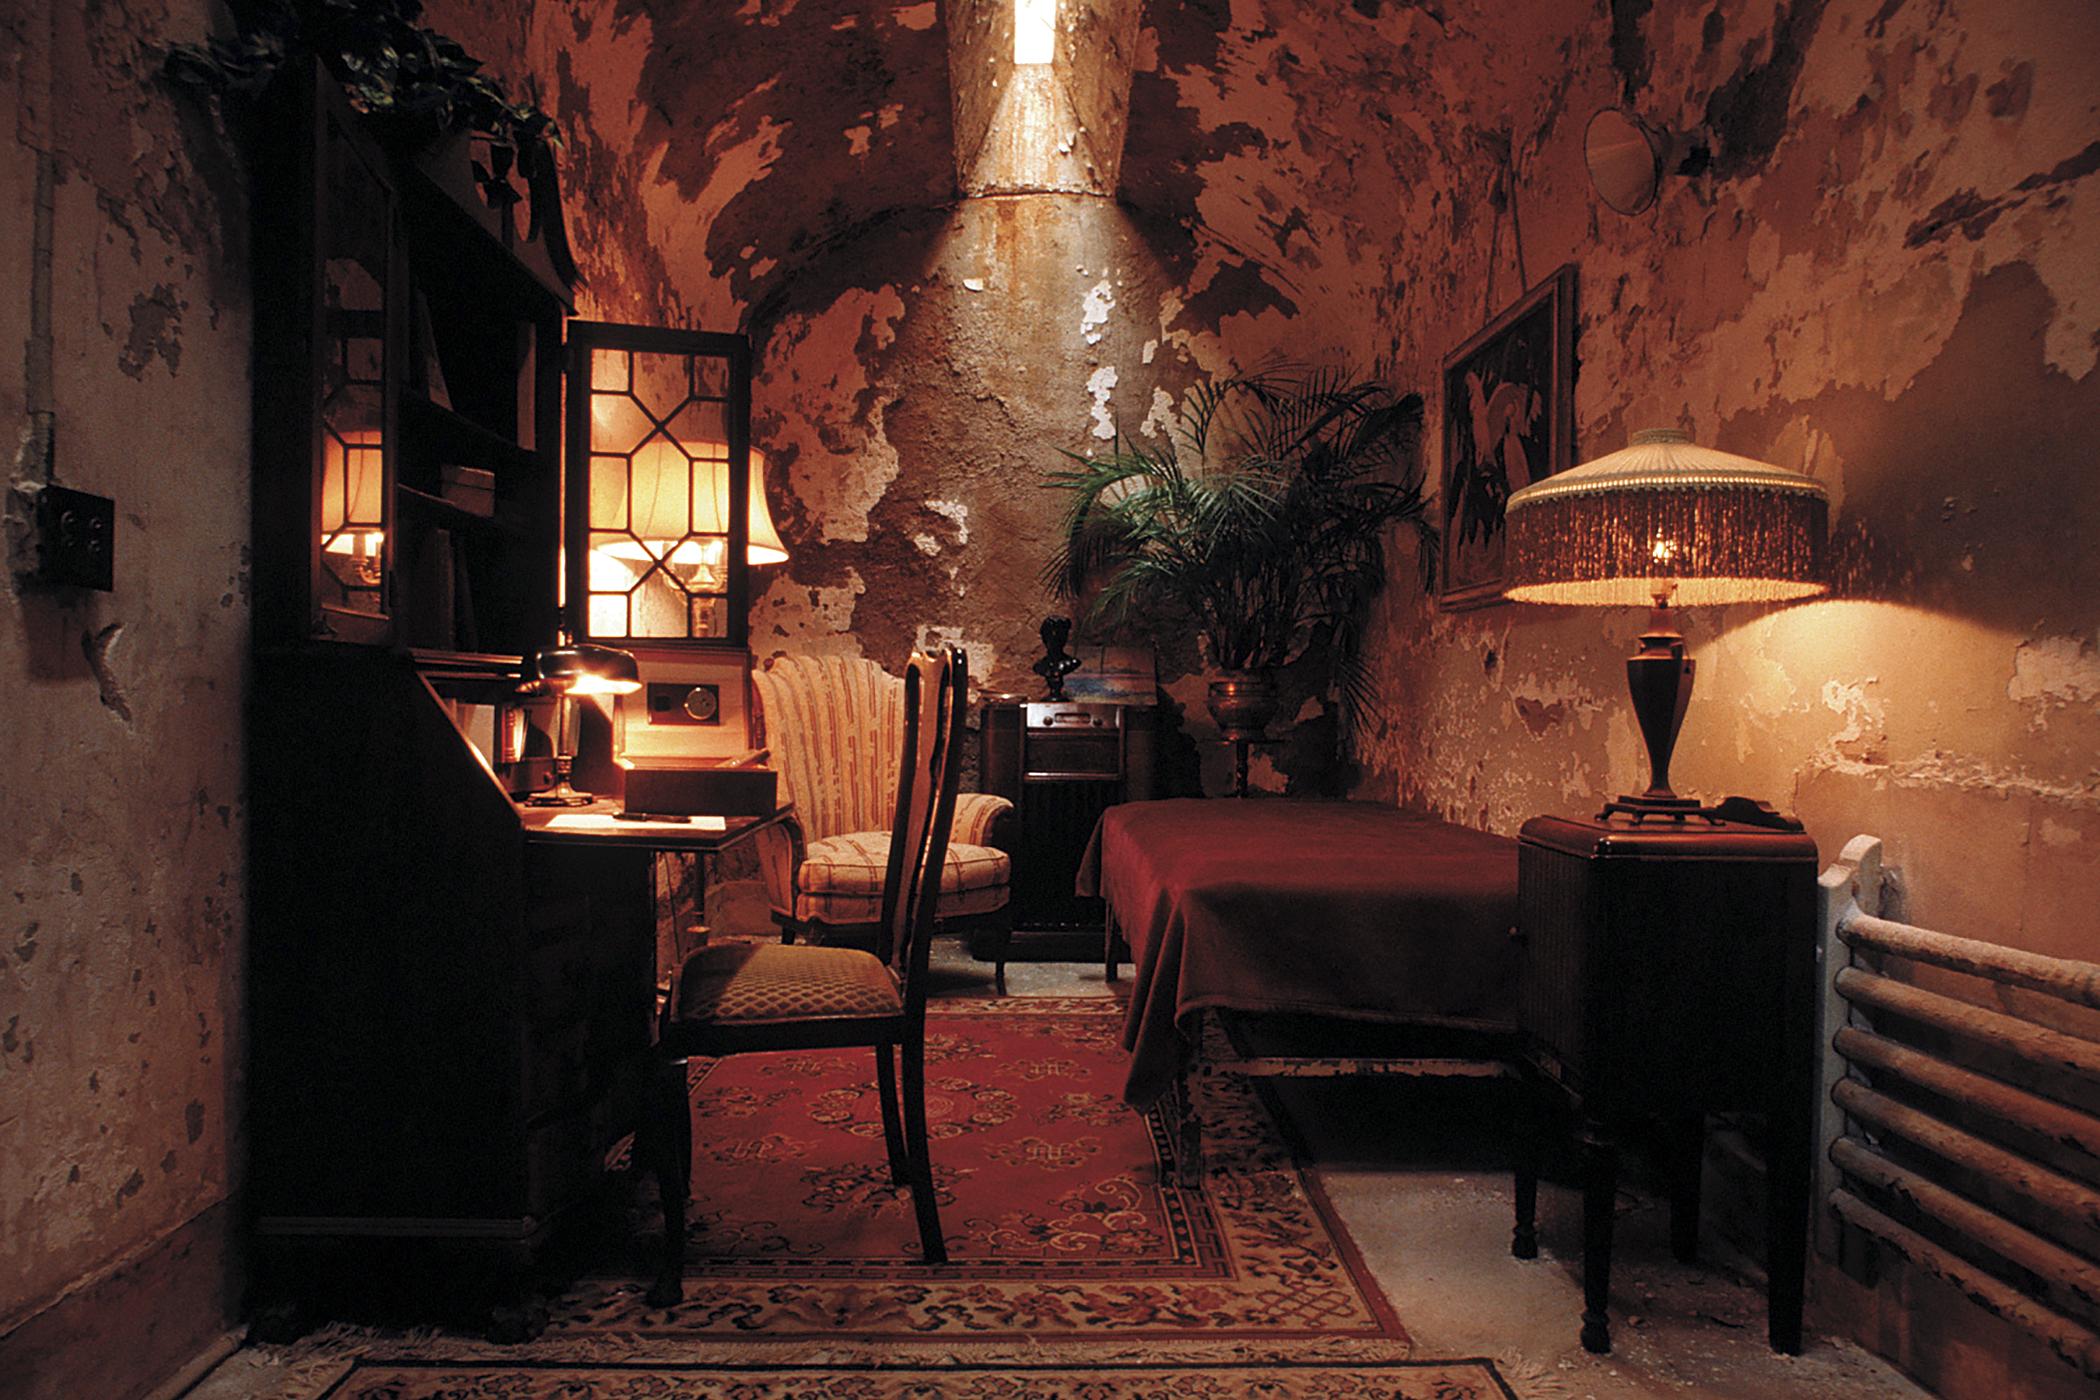 Al Capone's cell, Eastern State Penitentiary in Philadelphia, Pennsylvania